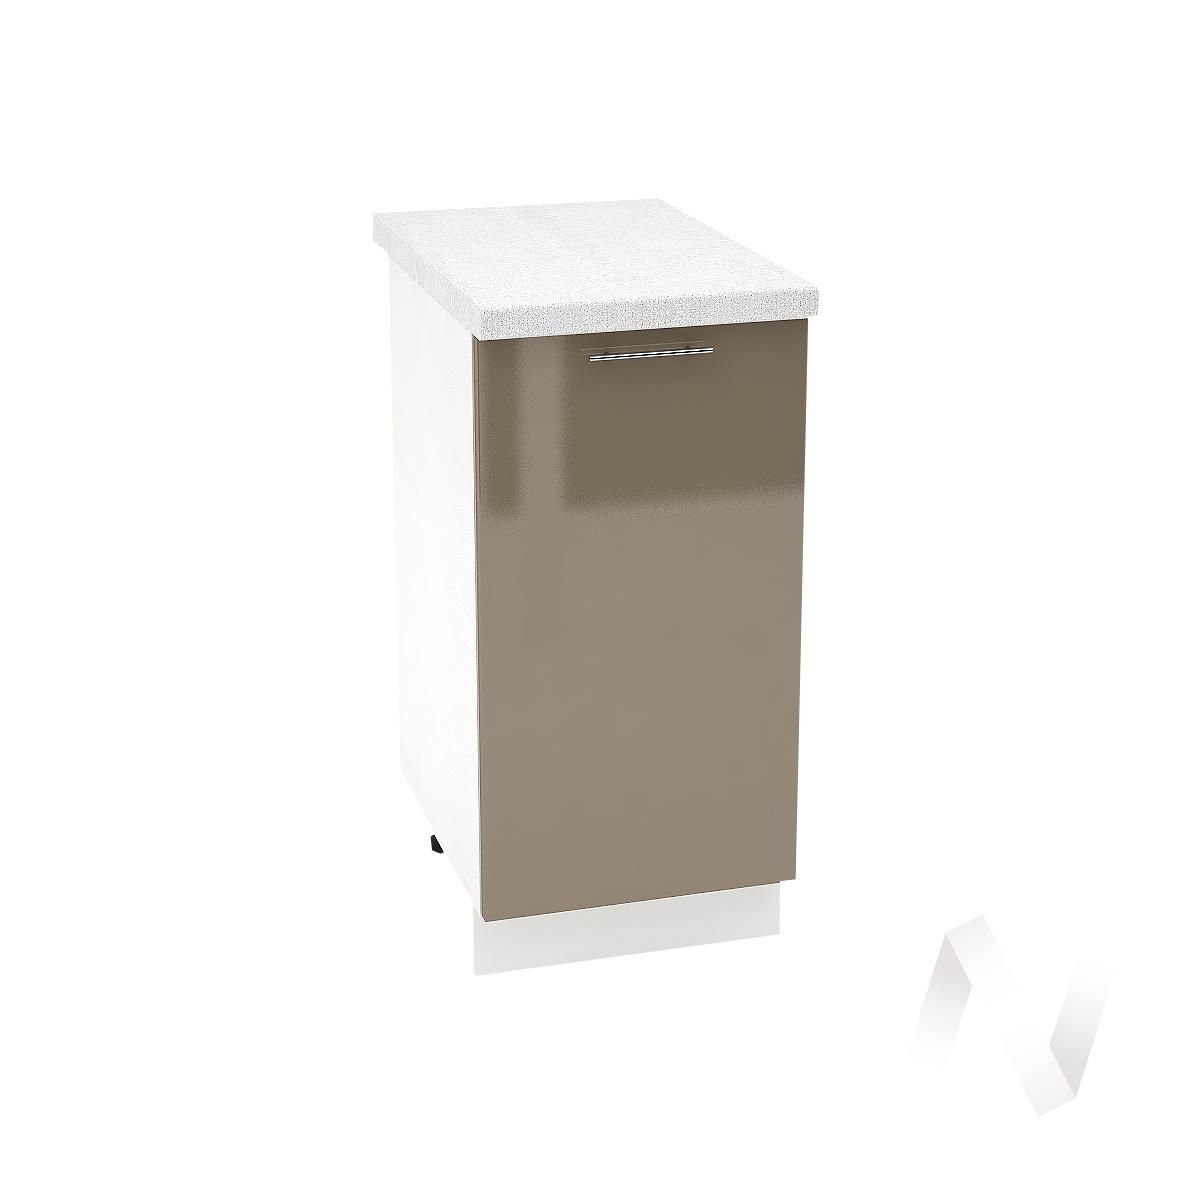 "Кухня ""Валерия-М"": Шкаф нижний 400, ШН 400 (Капучино глянец/корпус белый)"